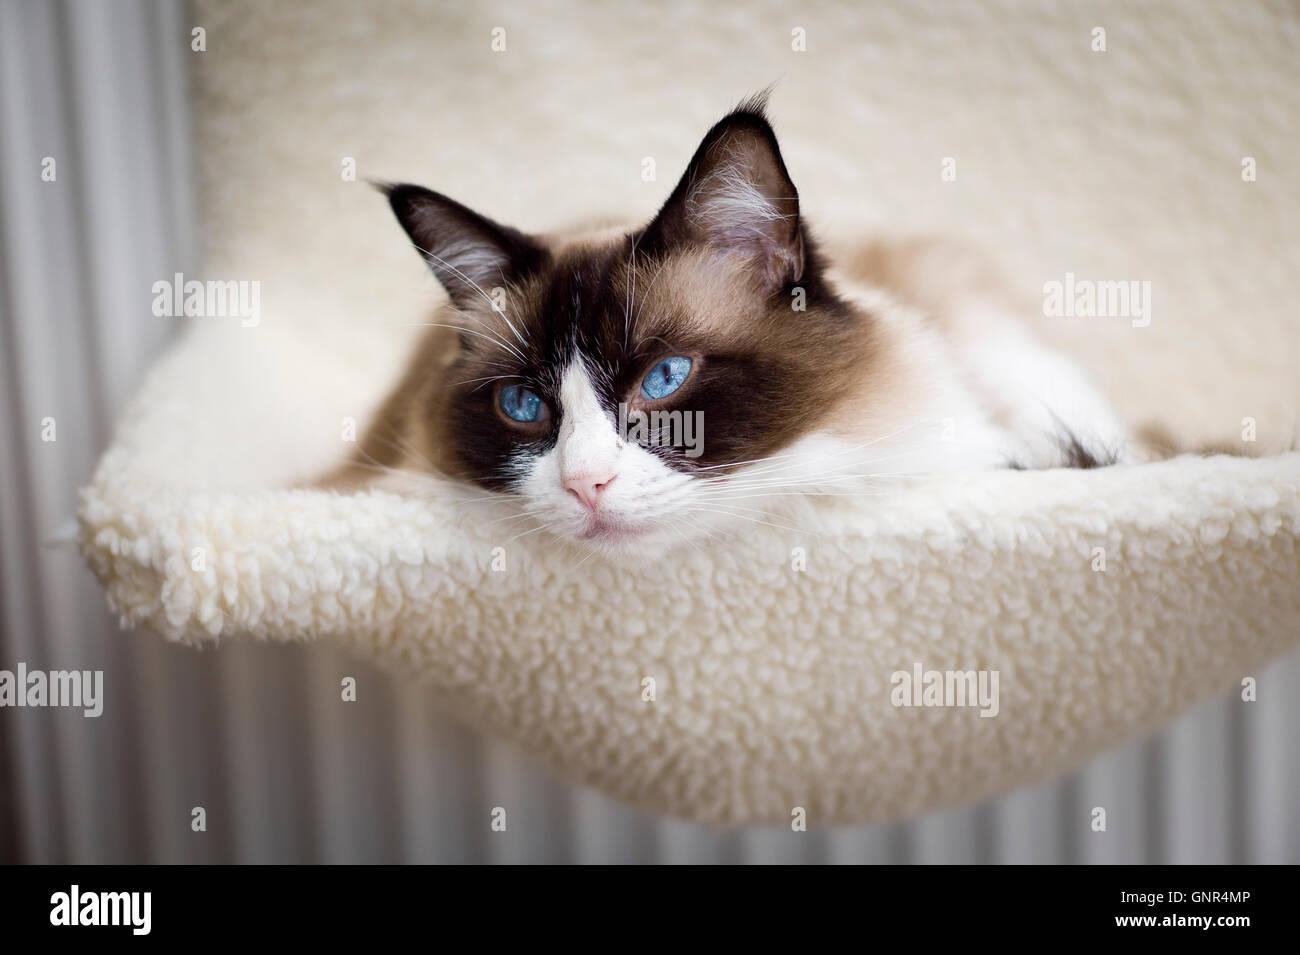 Ragdoll cat relaxing in a radiator hammock - Stock Image